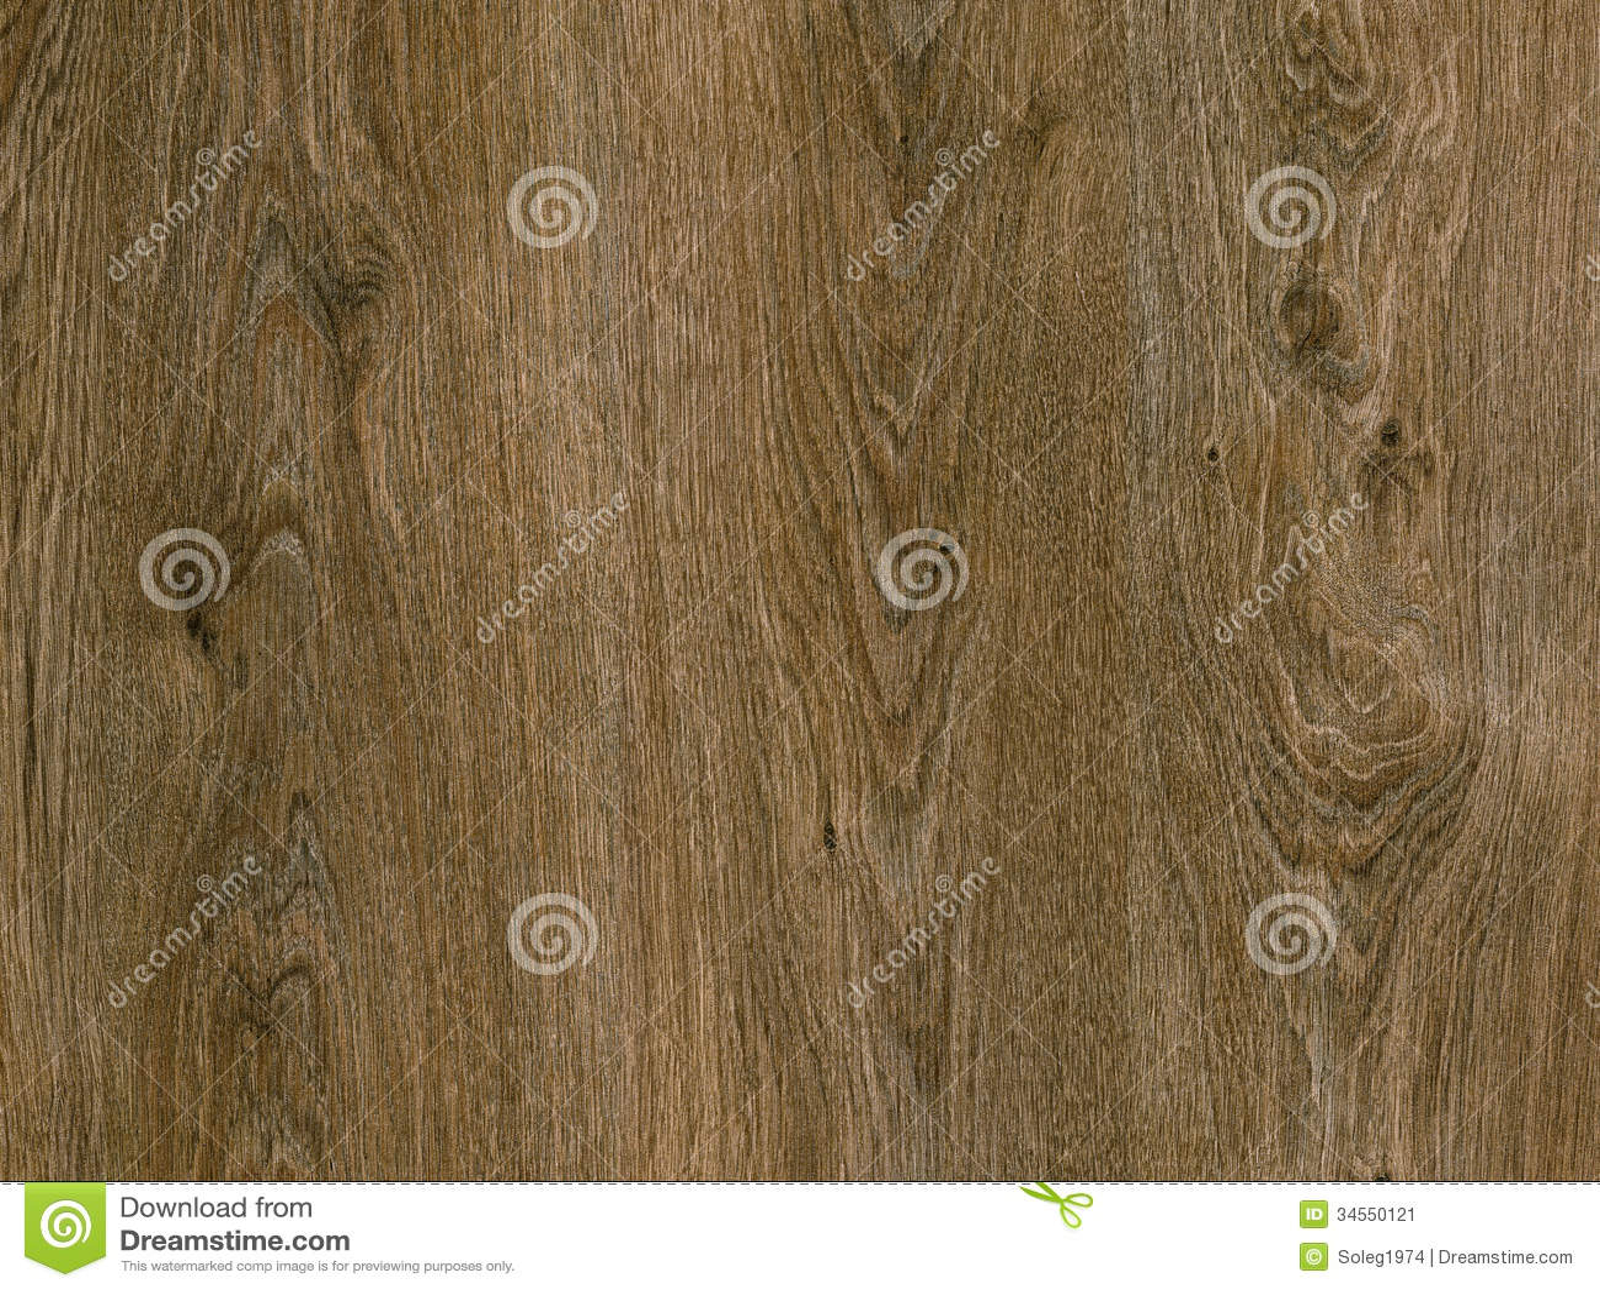 dark brown wood background stock image image 34550121